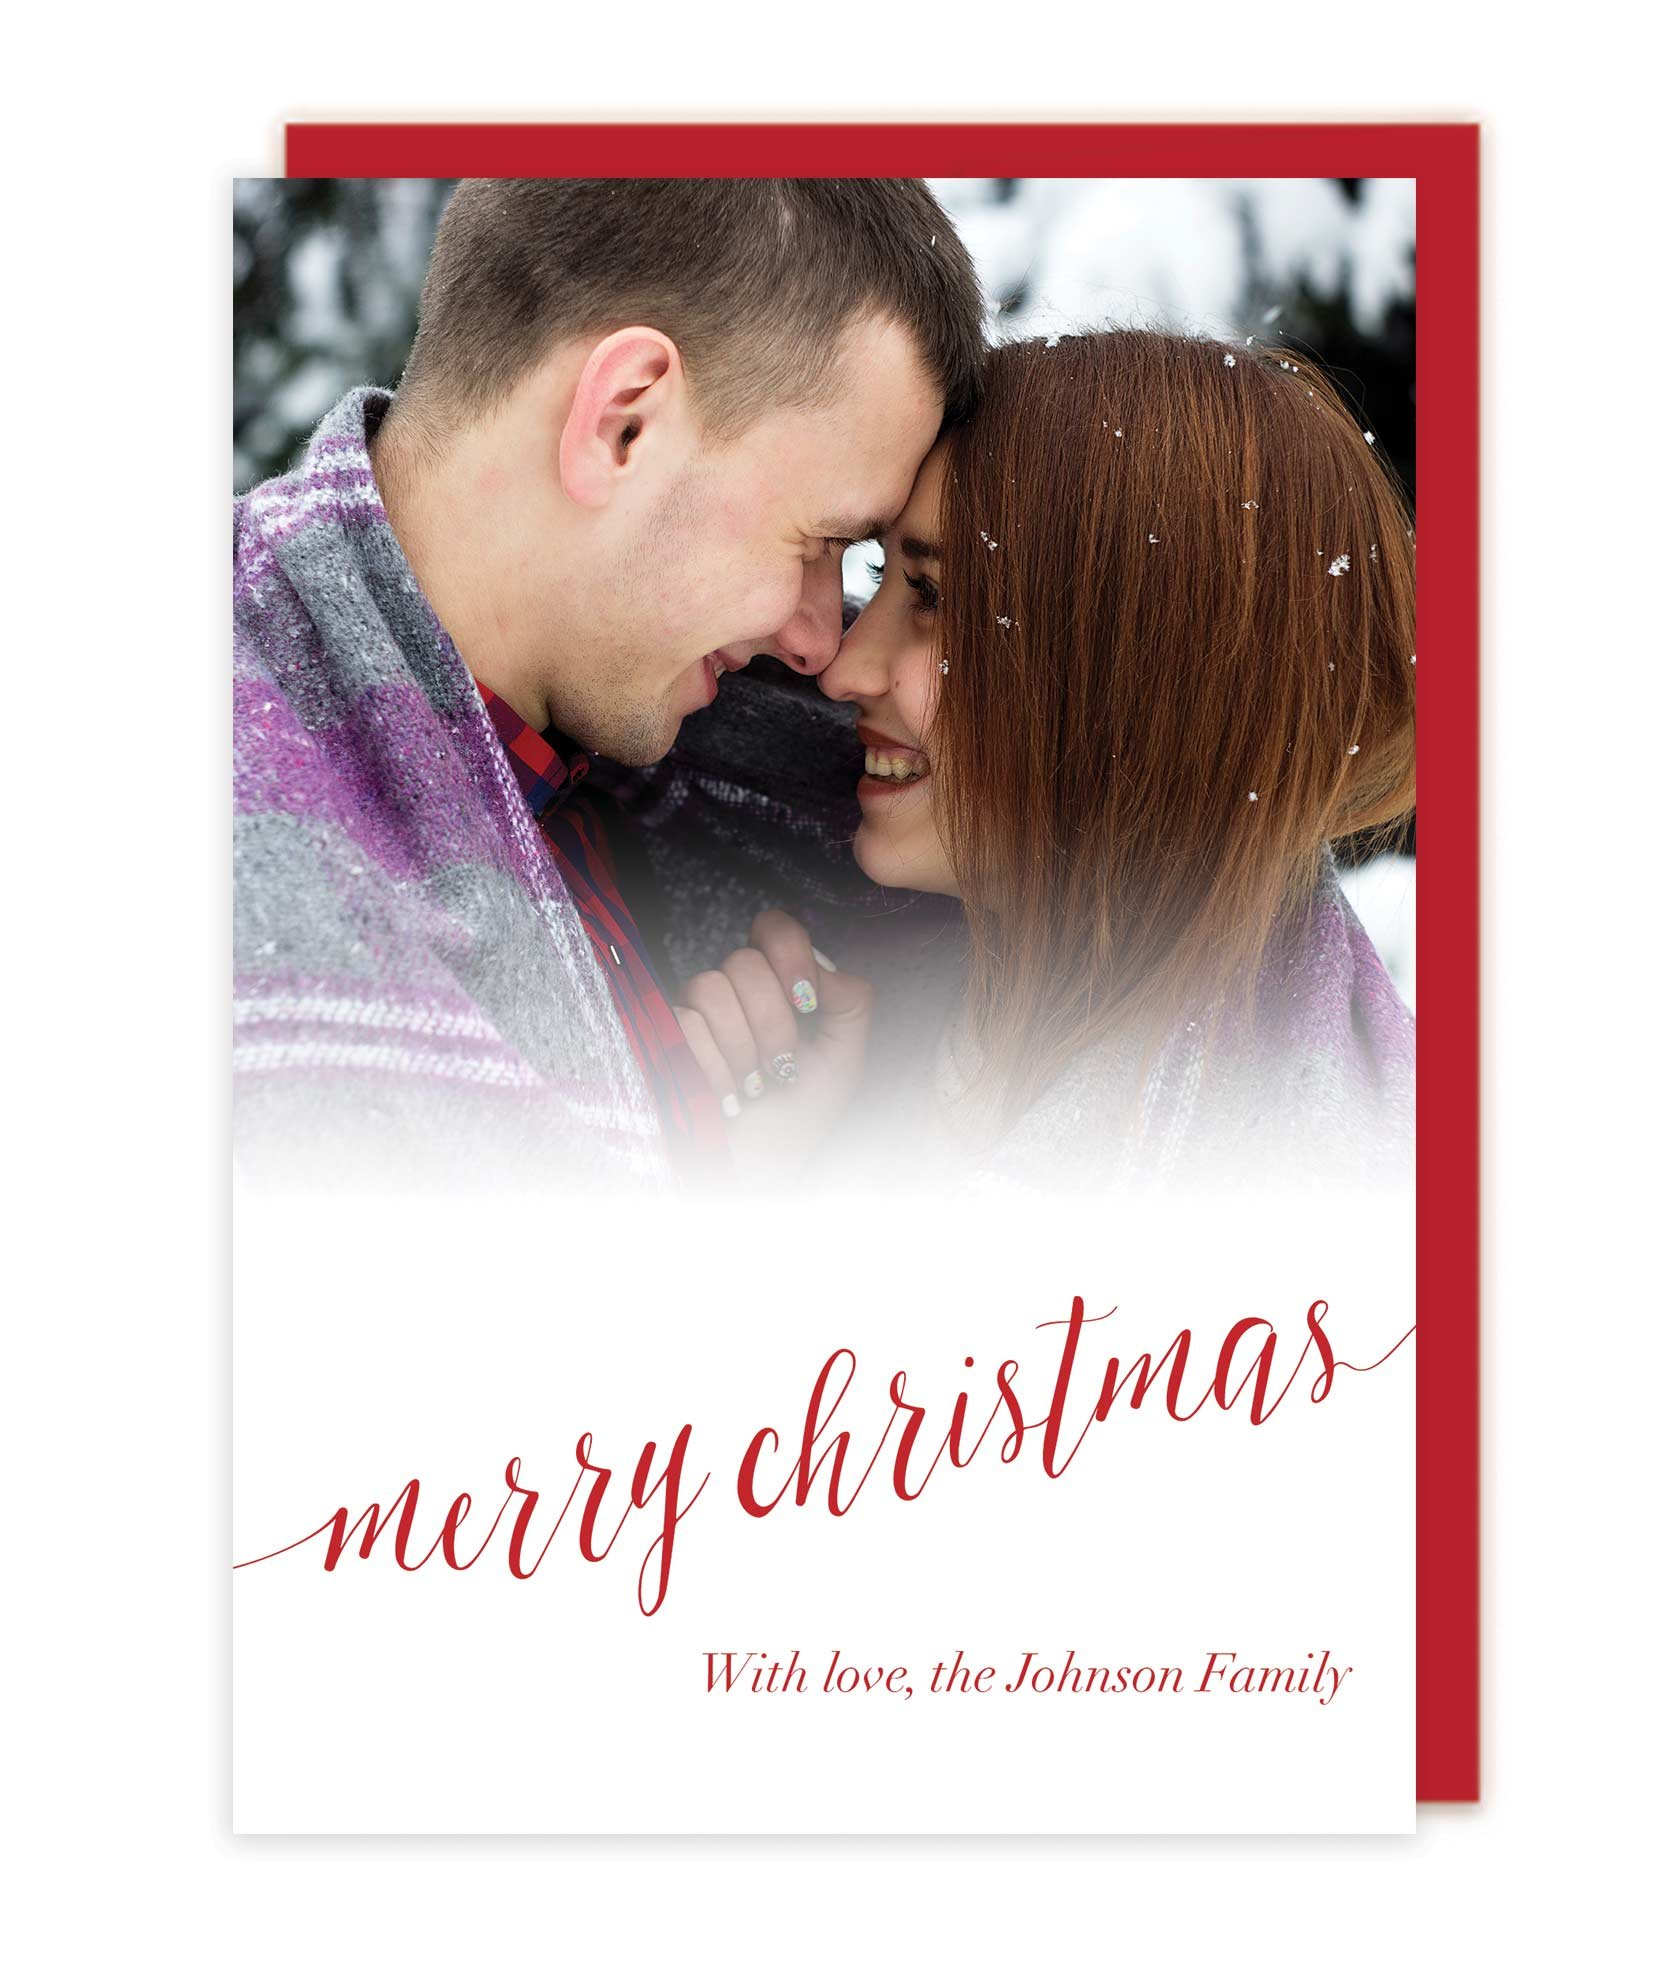 Photo Letterpress Christmas Cards - Merry Christmas